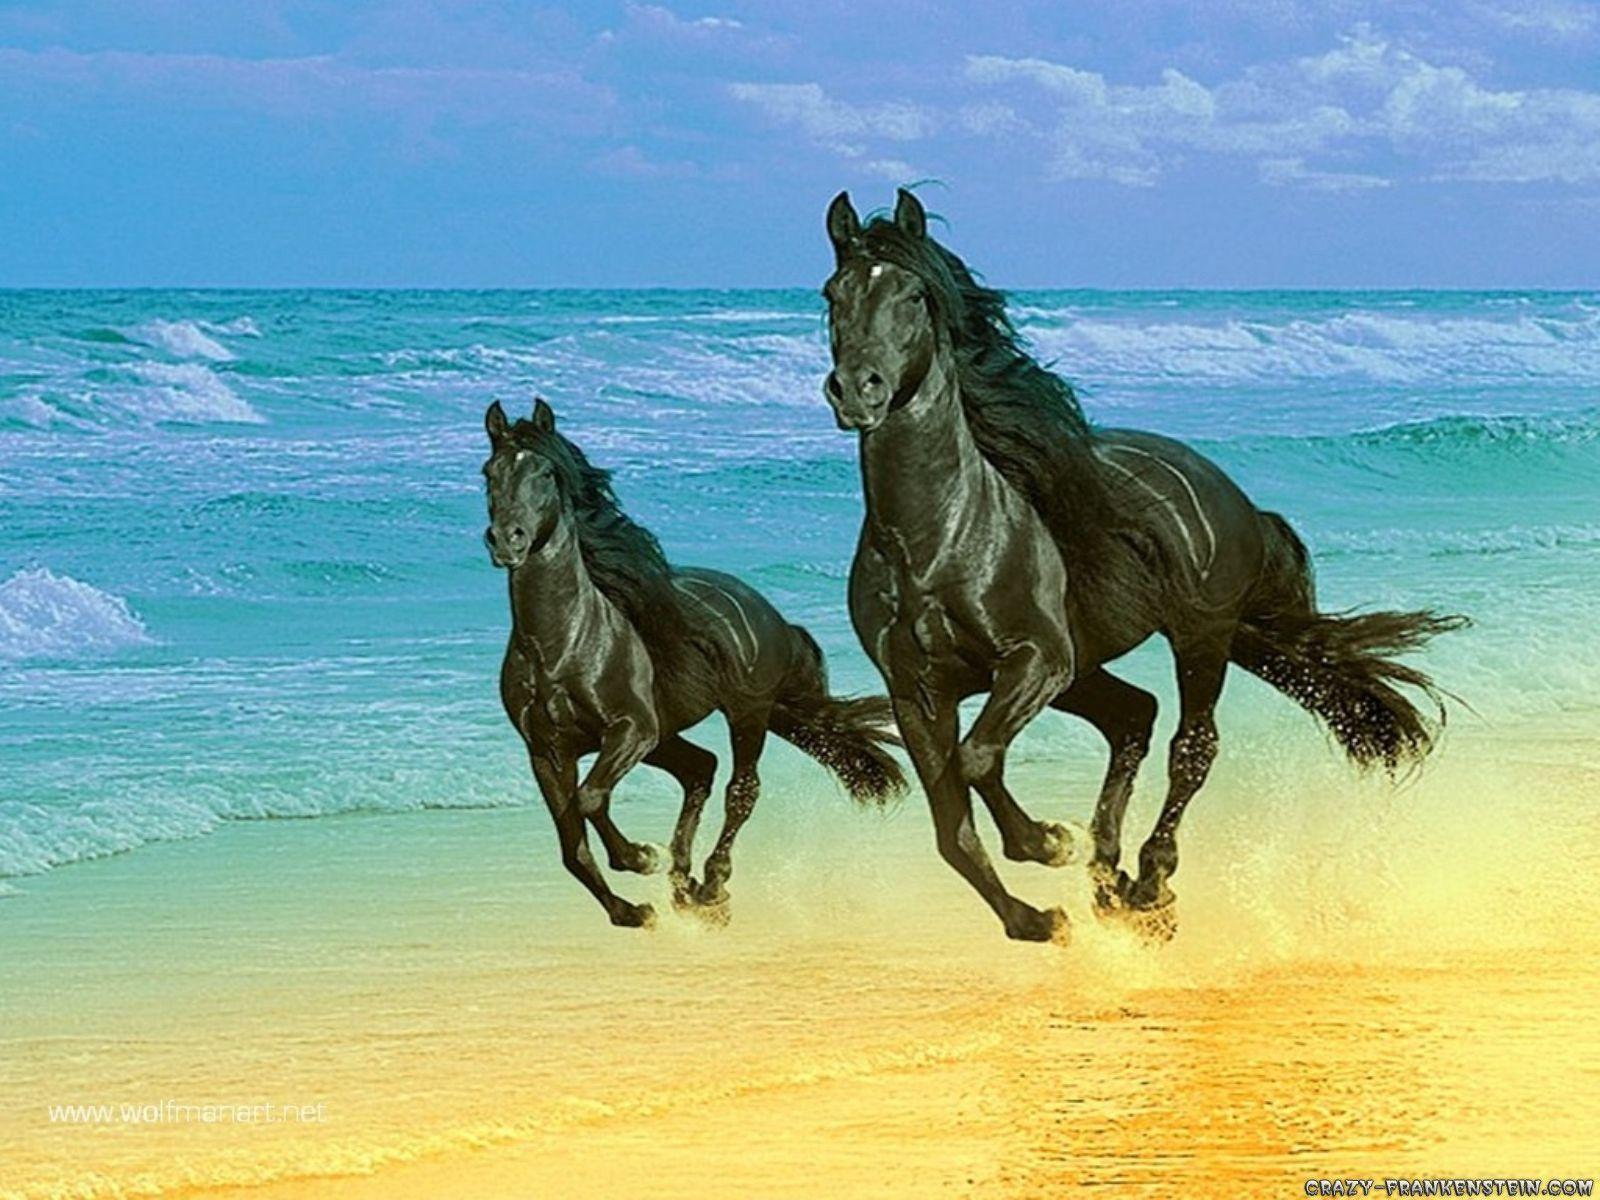 Horse hd wallpapers free wallpaper downloads horse hd desktop hd horse hd wallpapers free wallpaper downloads horse hd desktop altavistaventures Gallery